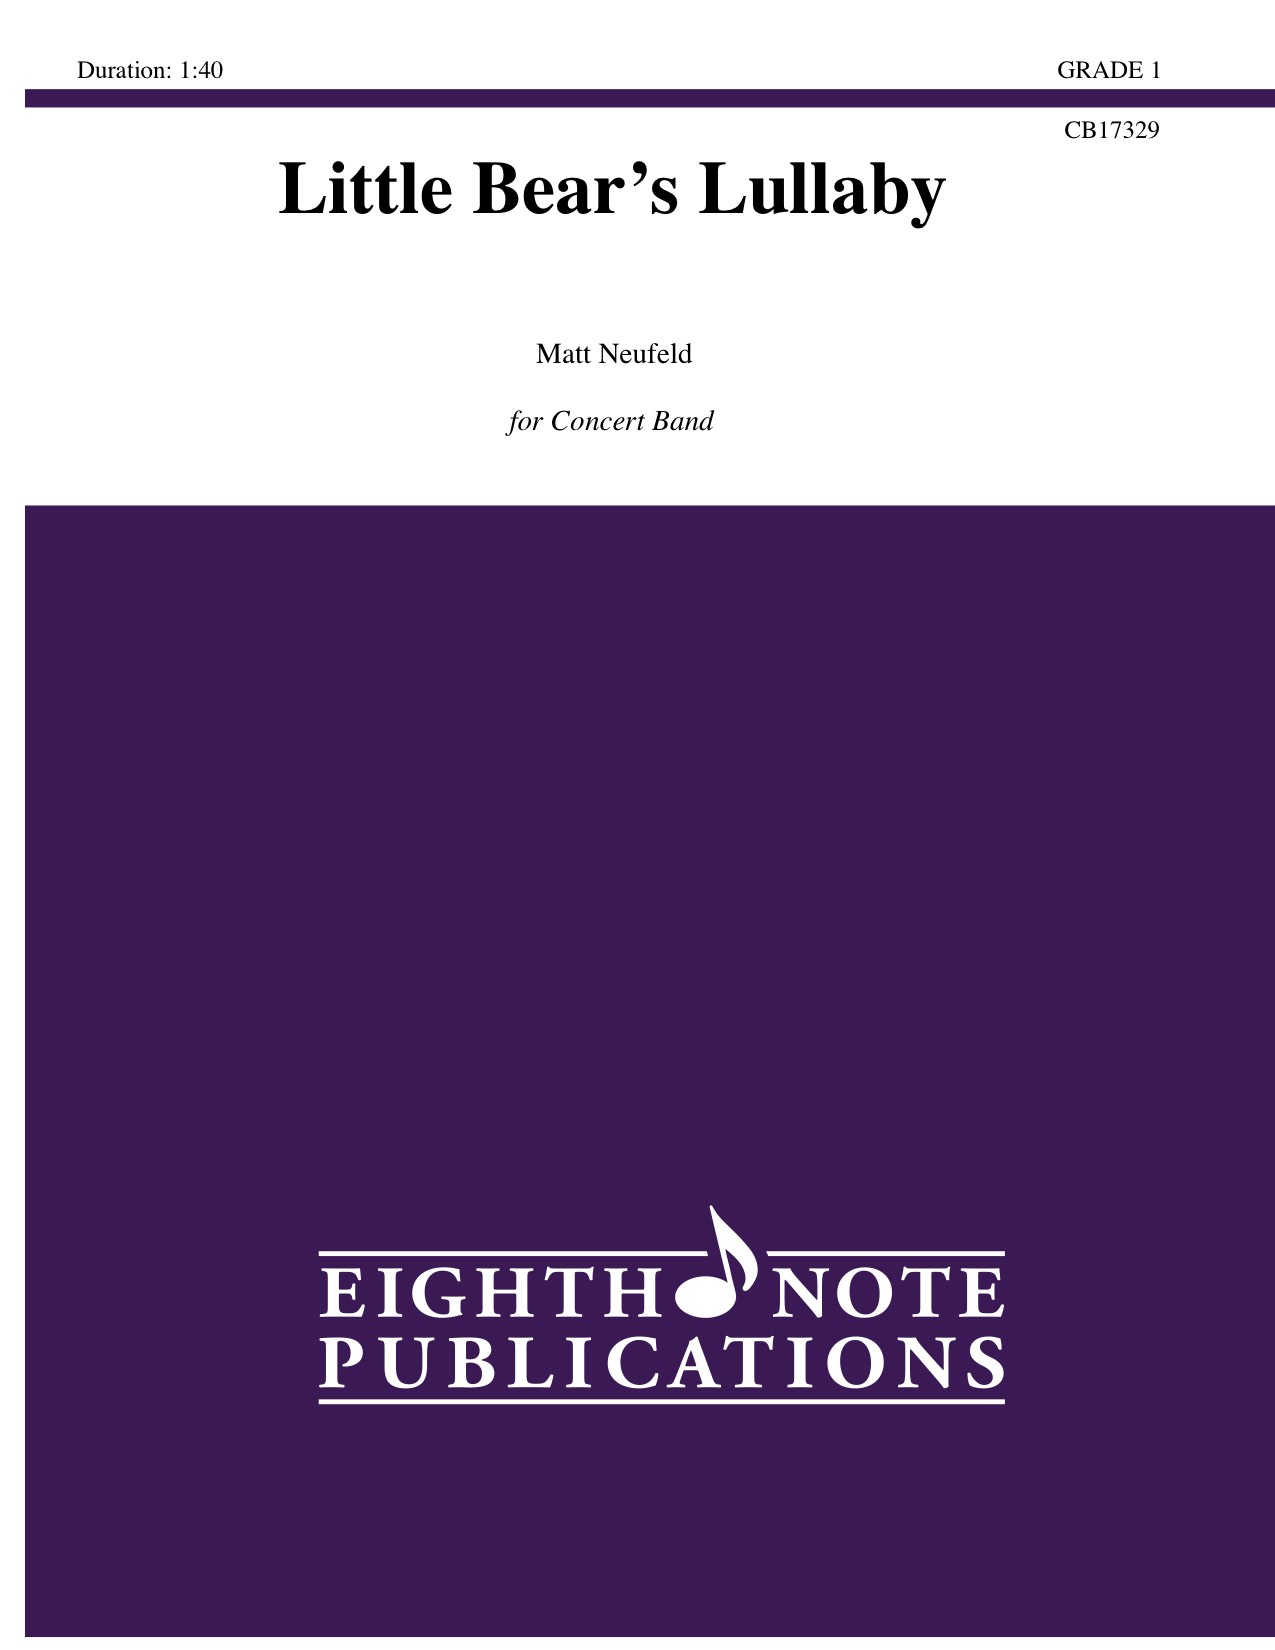 Little Bear�s Lullaby - Matt Neufeld